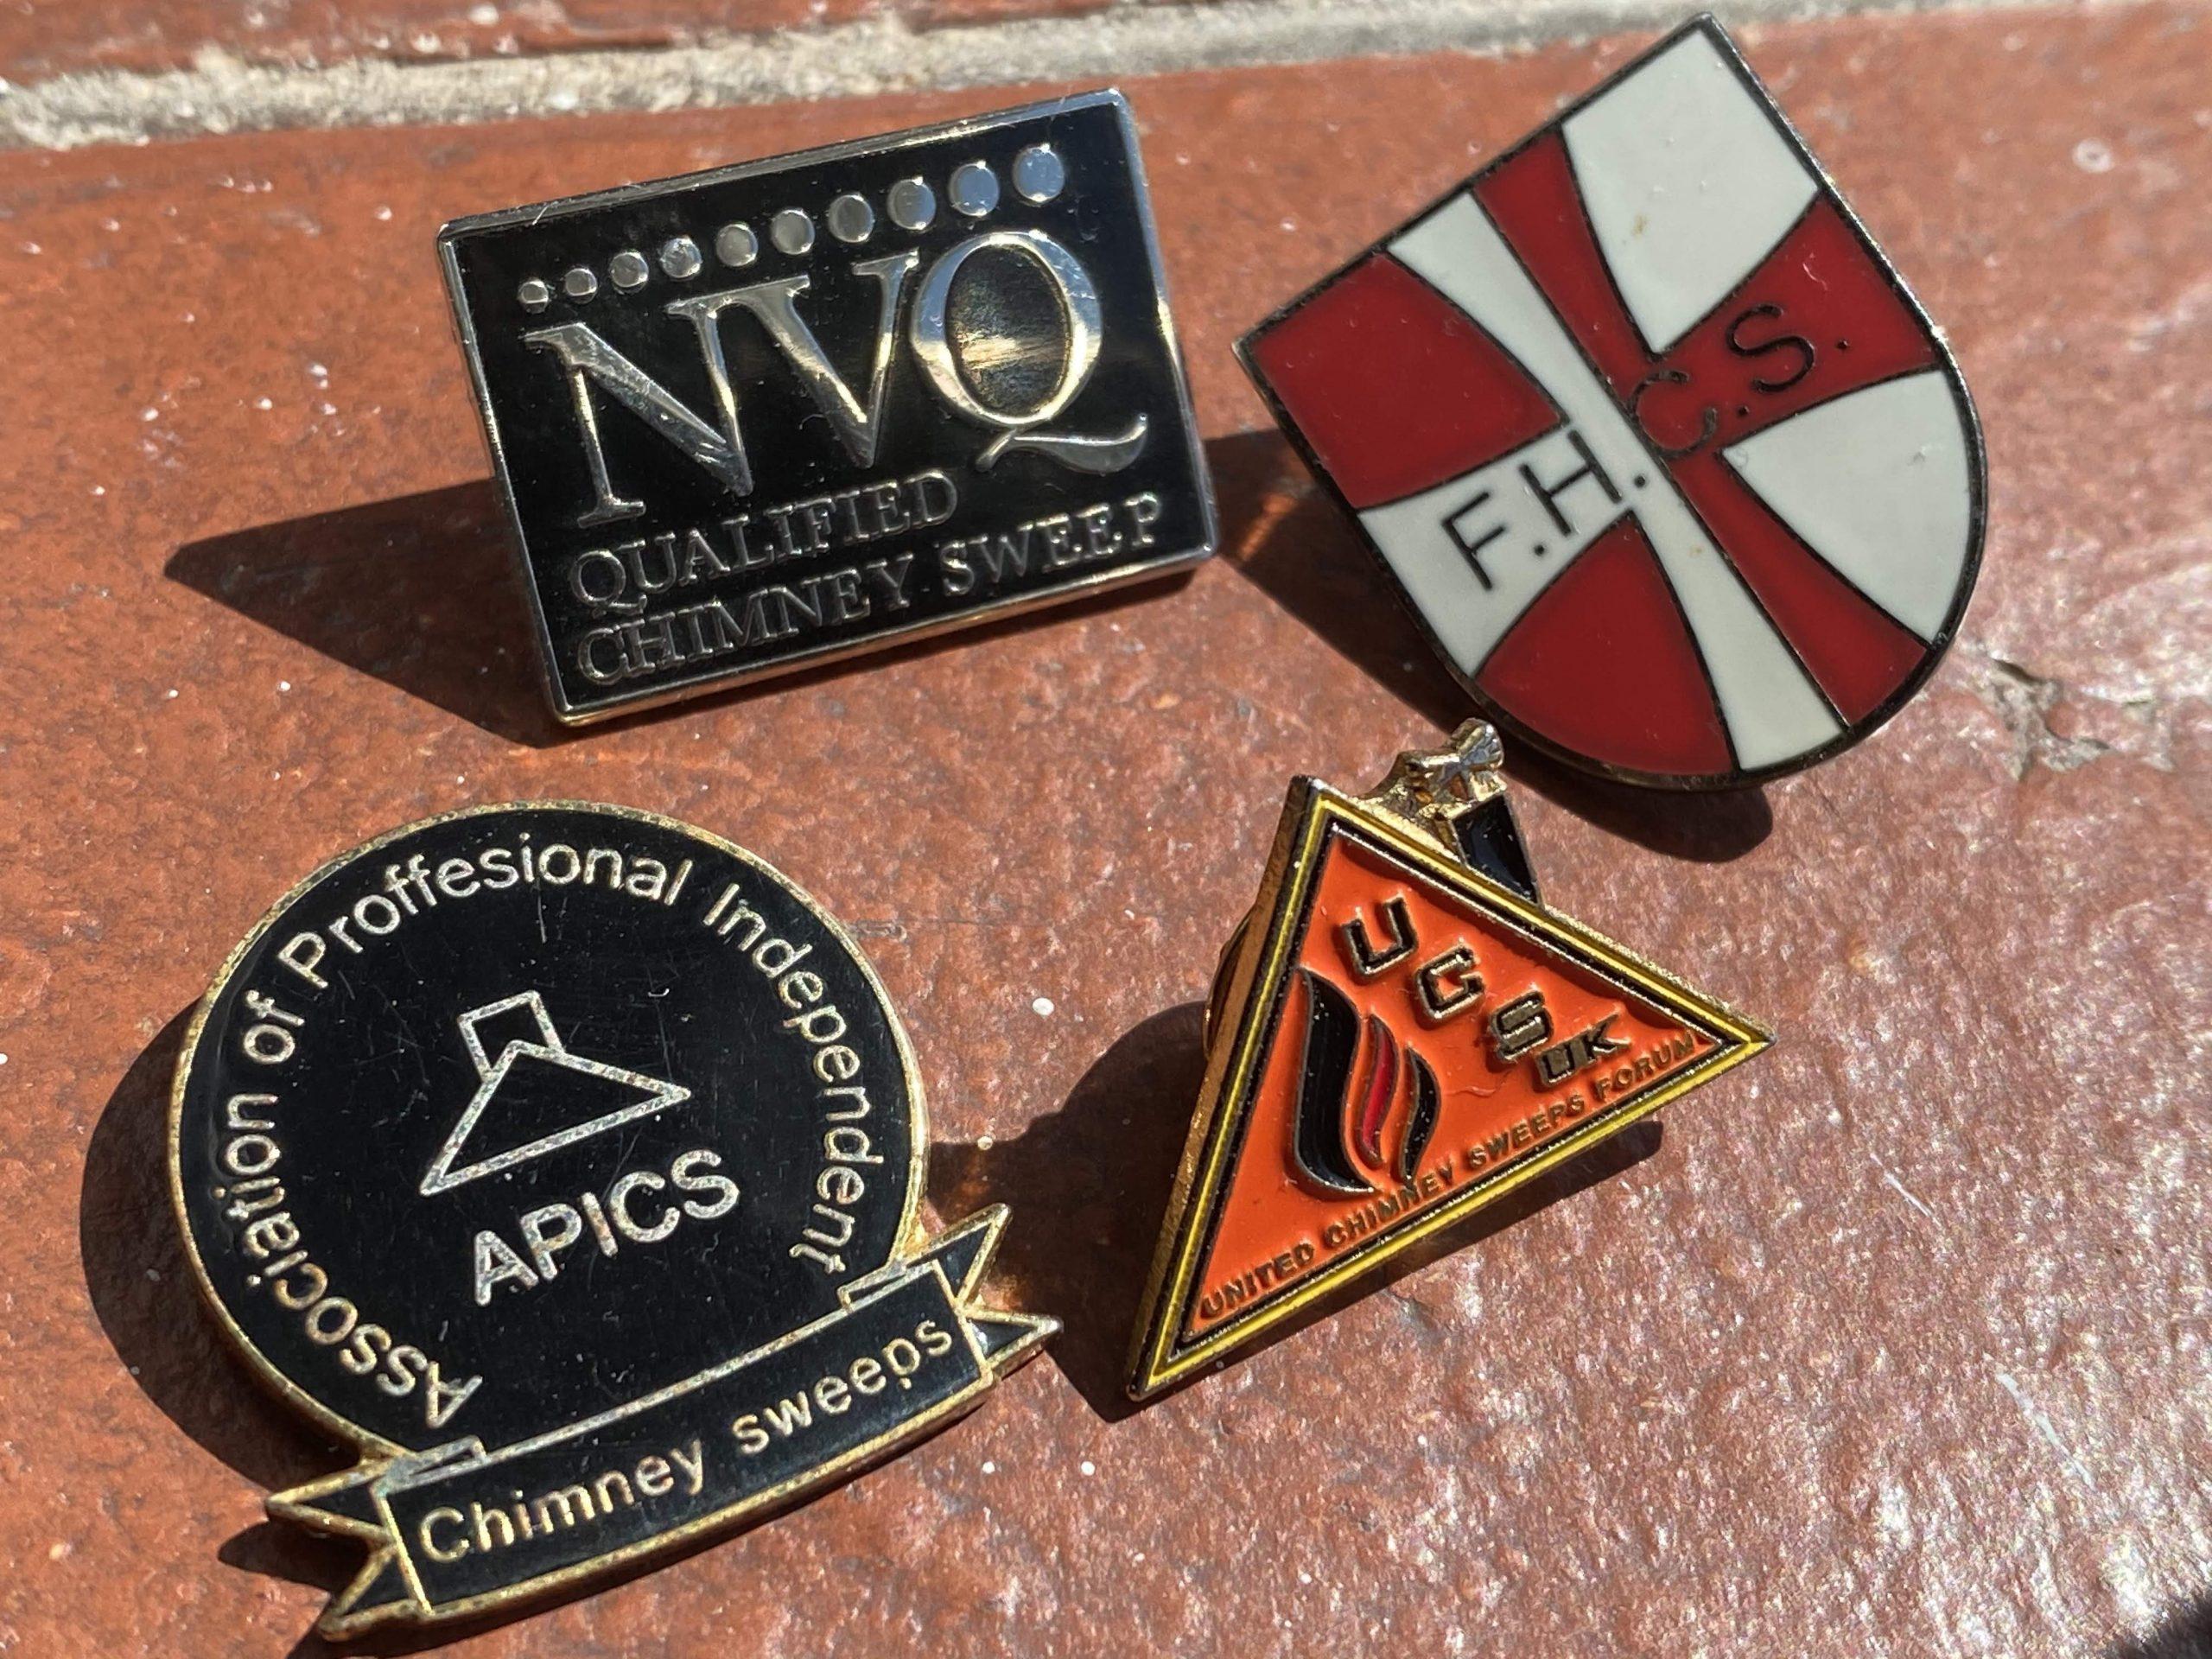 Exeter Chimney Sweep enamel badges